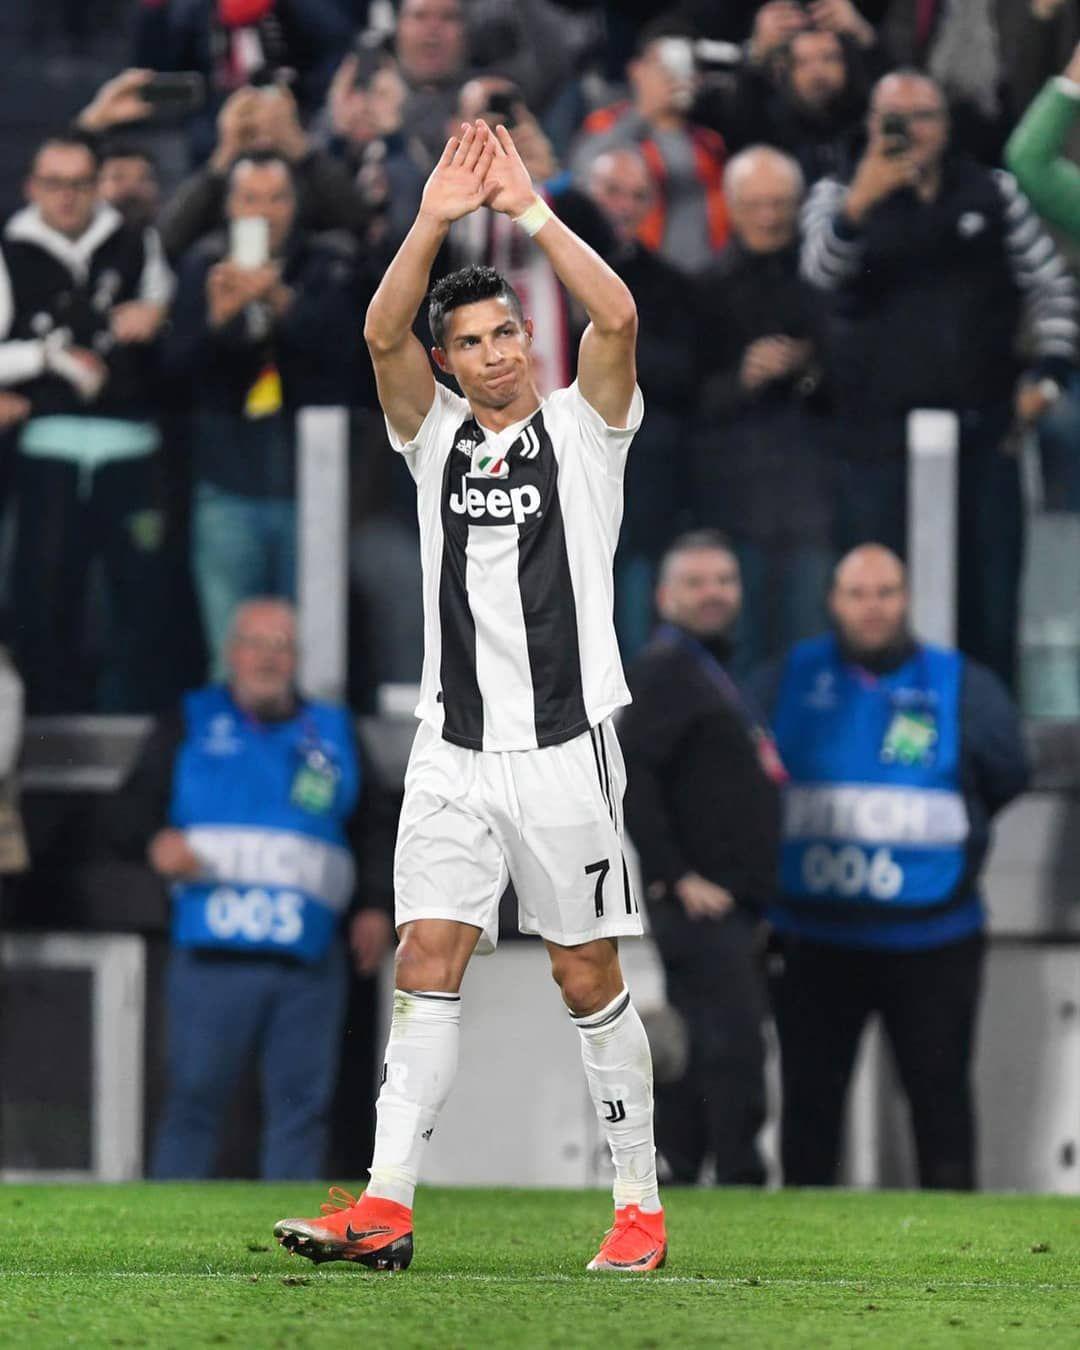 Cristiano Ronaldo On Instagram Ronaldo Ronaldo Football Cristiano Ronaldo